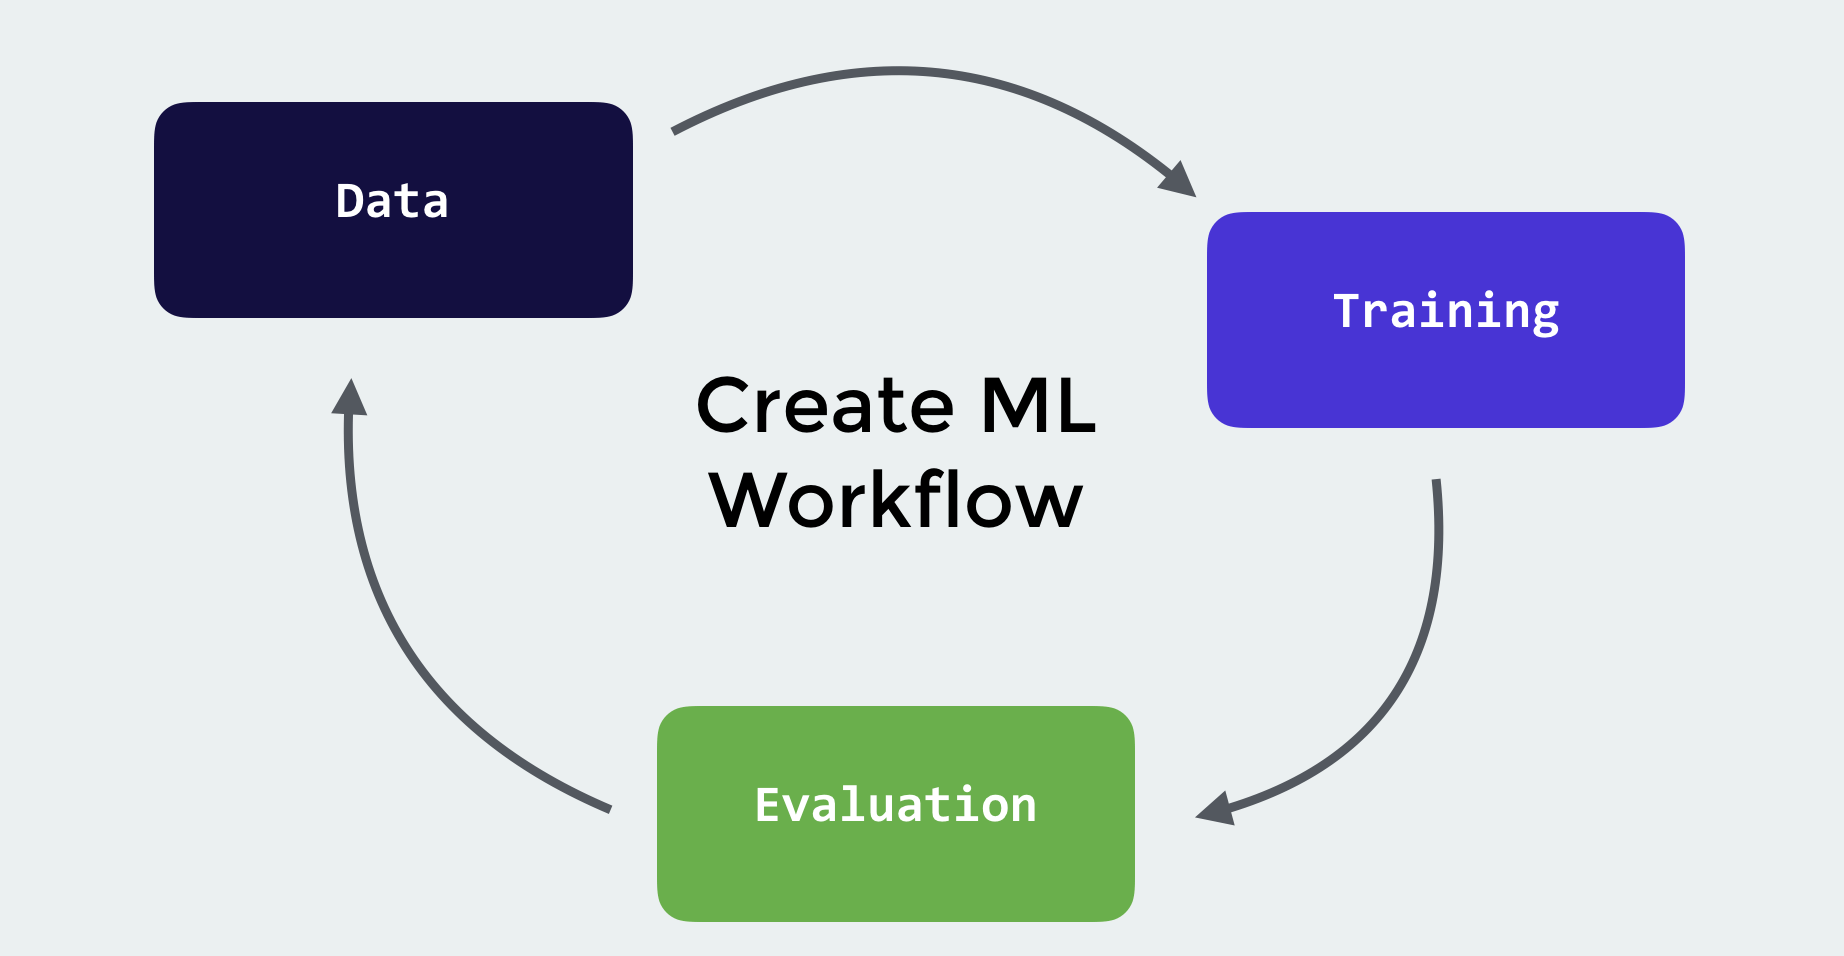 Create ML 簡介:如何在 Xcode 10 構建不同的機器學習模型